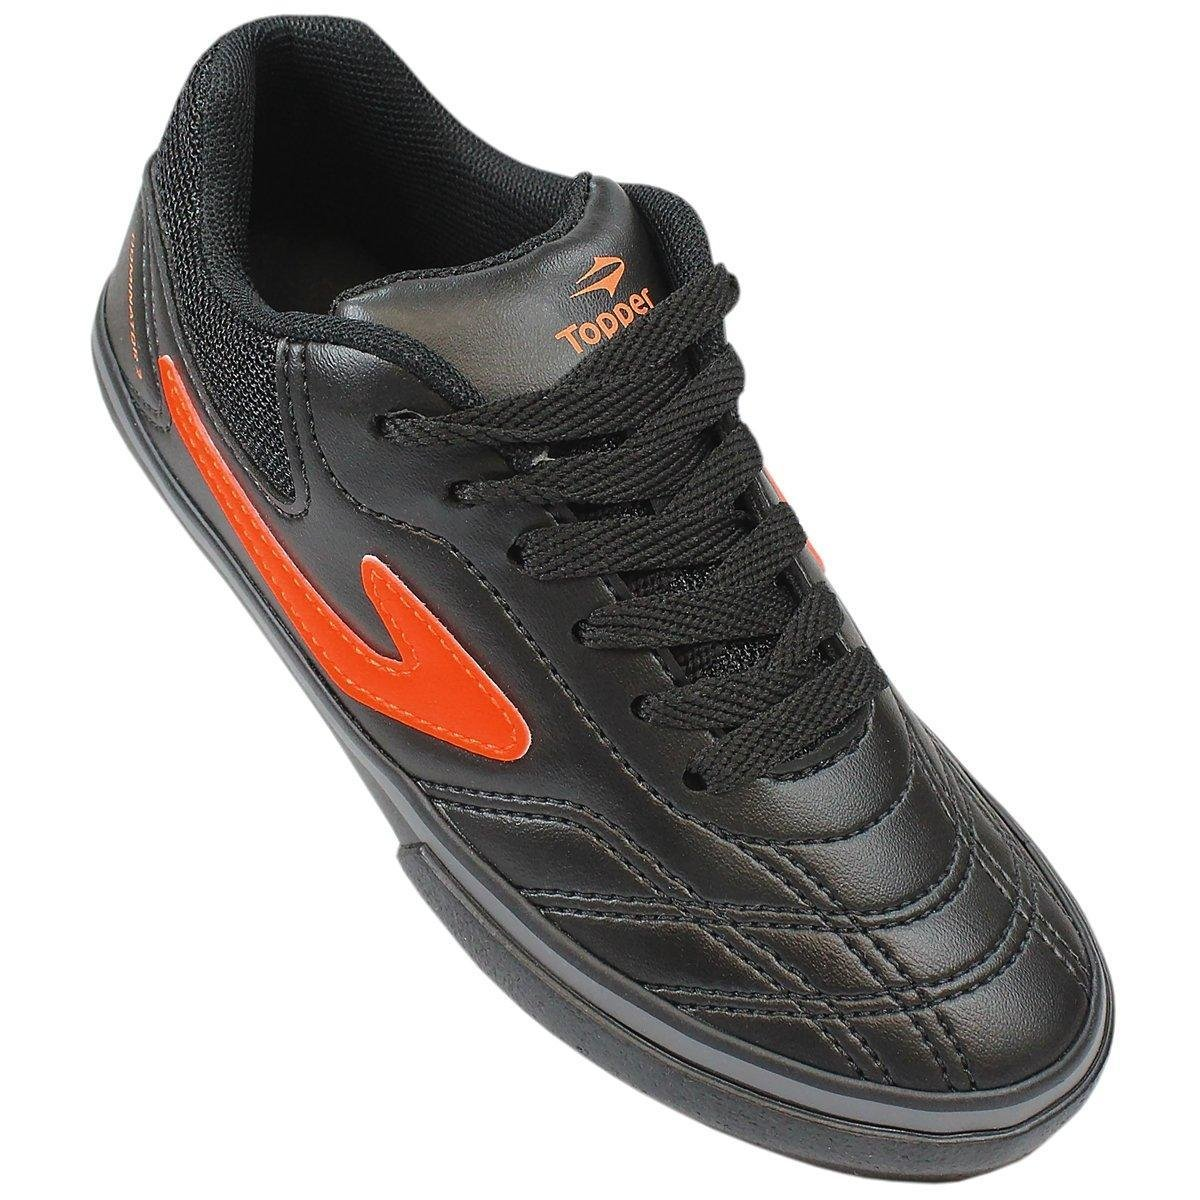 09648cfd24 Chuteira Futsal Infantil Topper Dominator 3 - Preto e Laranja ...